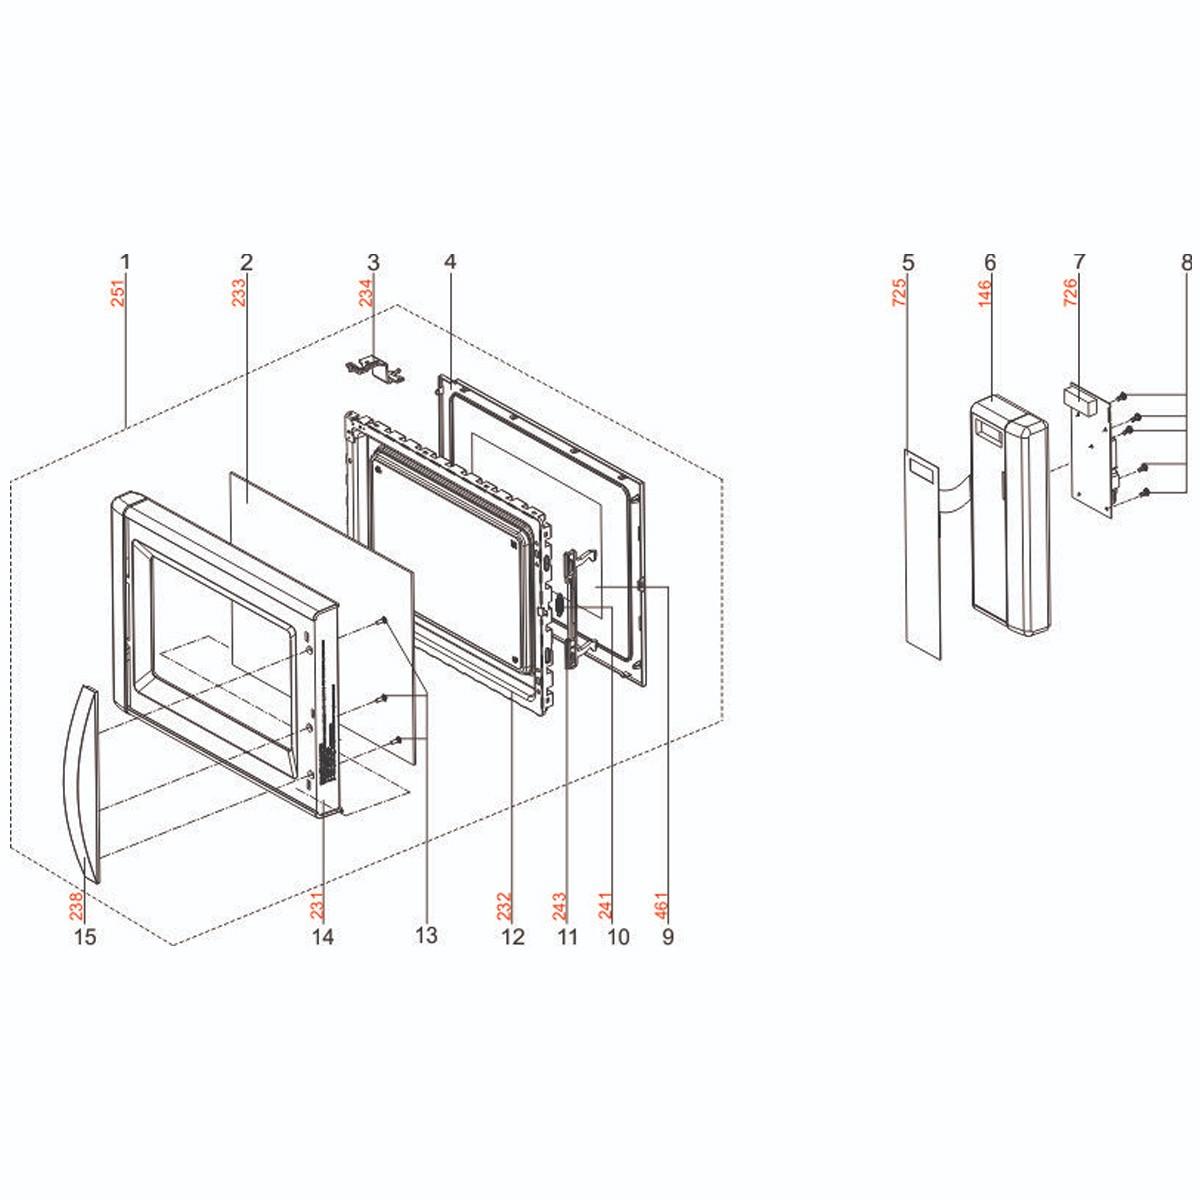 Placa Principal Display Microondas Electrolux 220v - 70001682